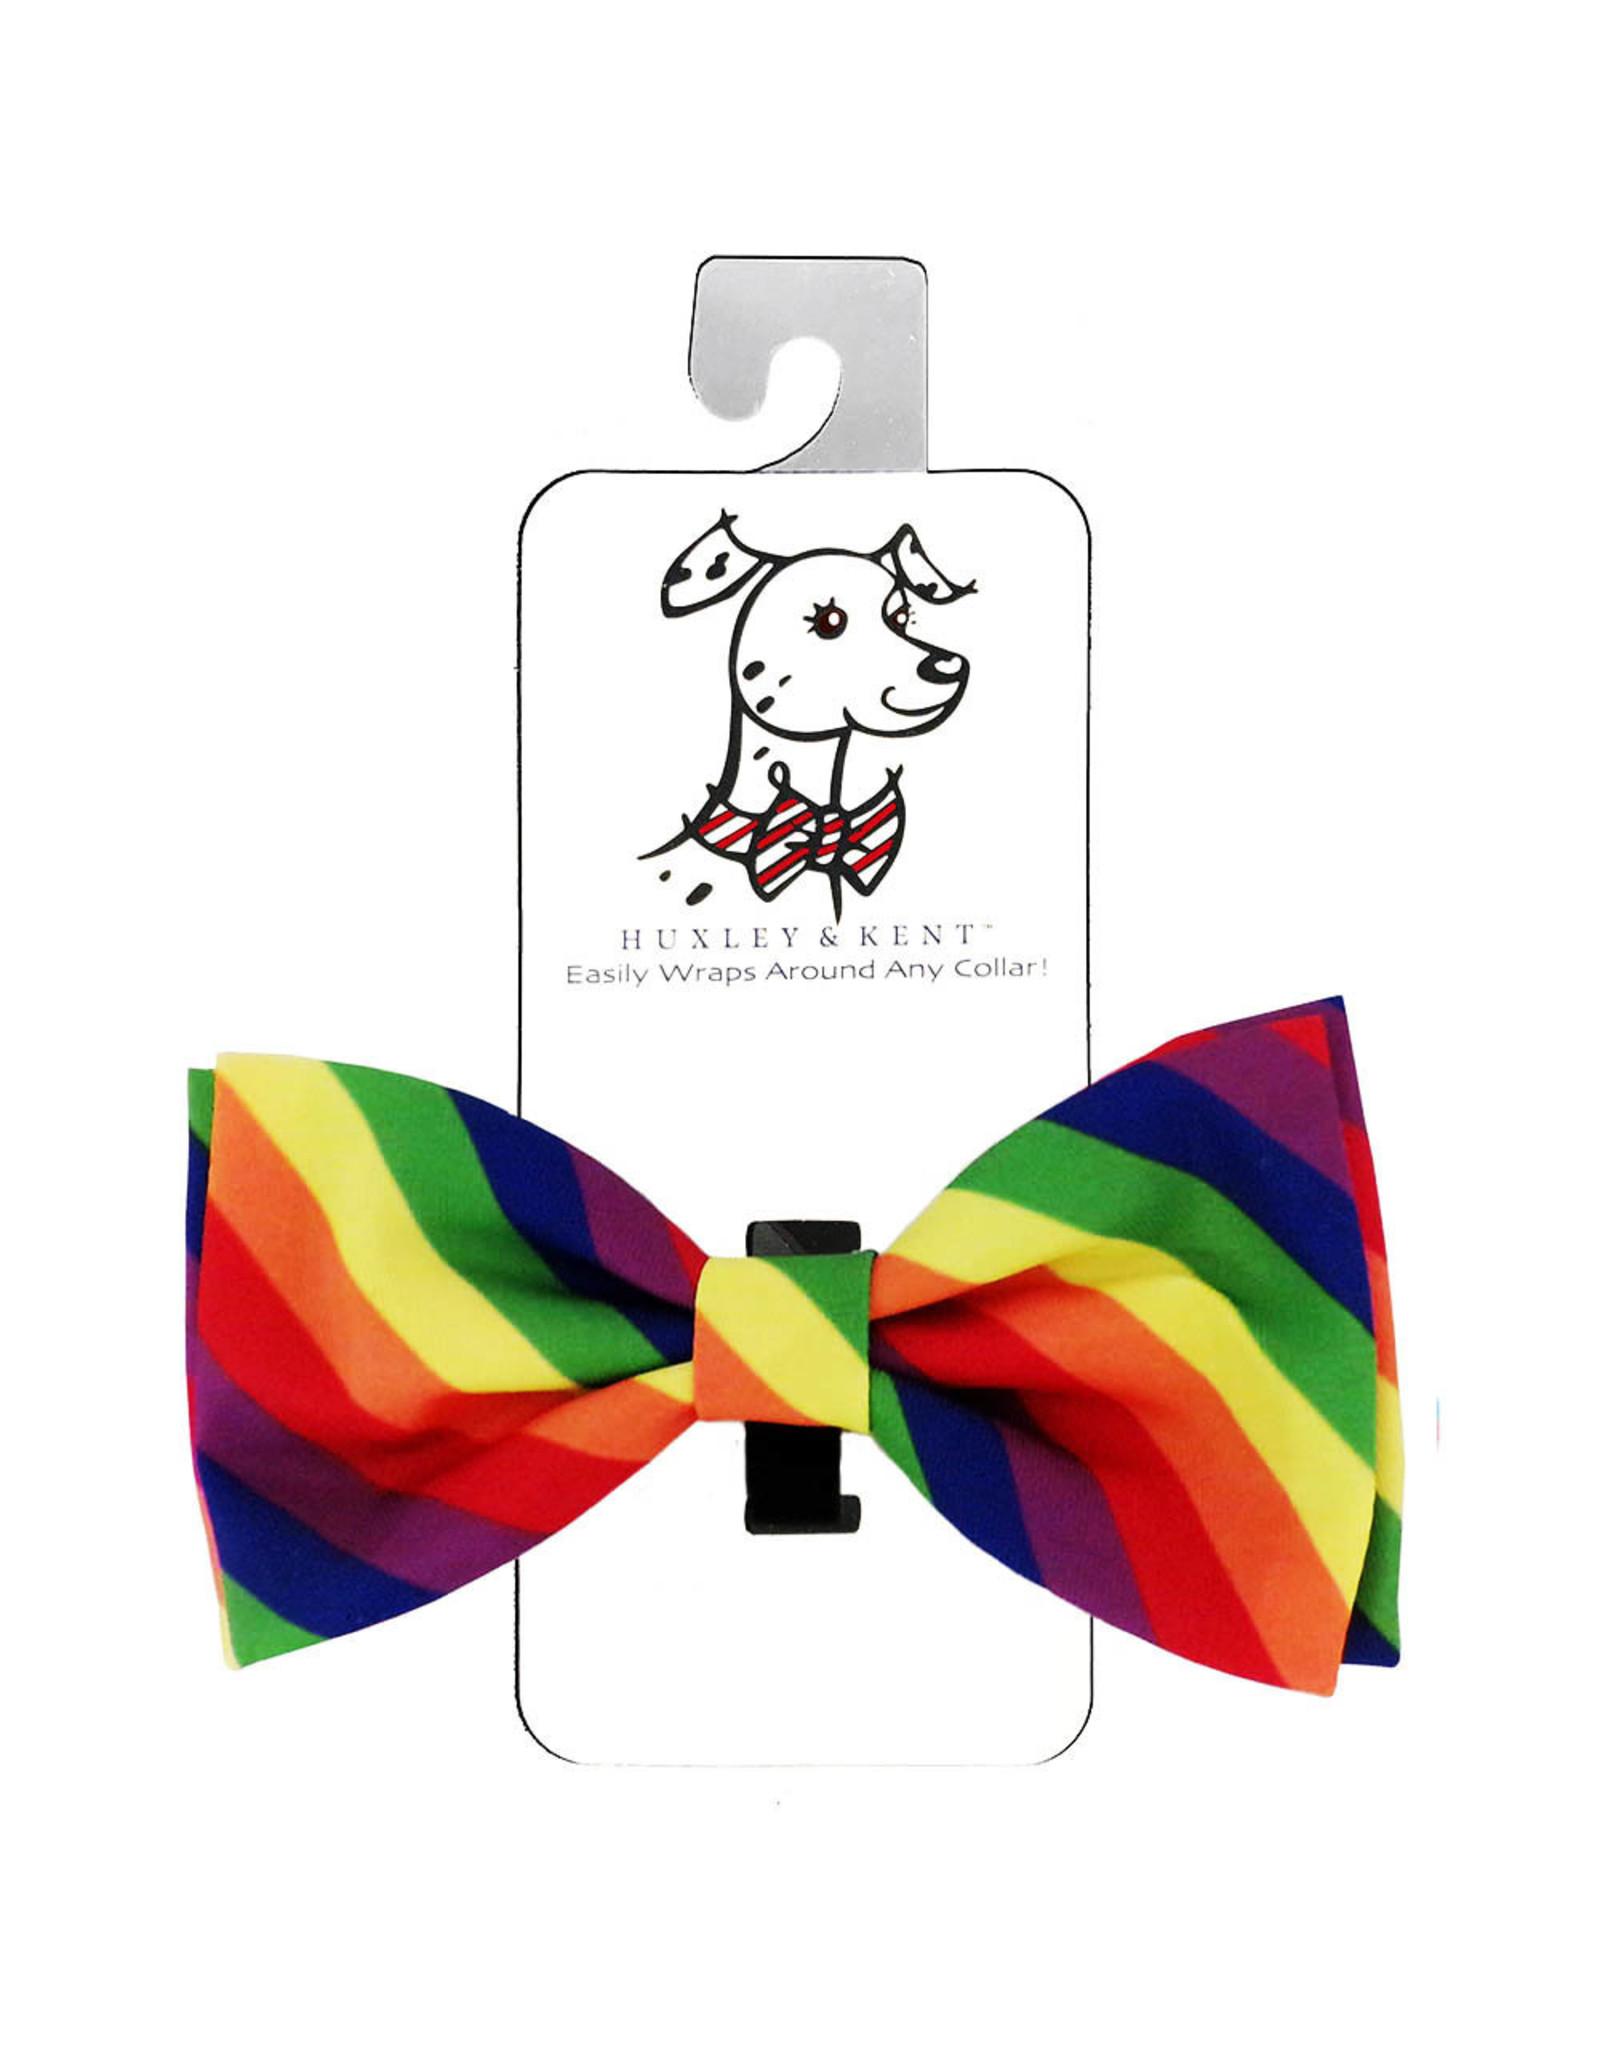 Huxley & Kent Bow Tie - Pride - Small